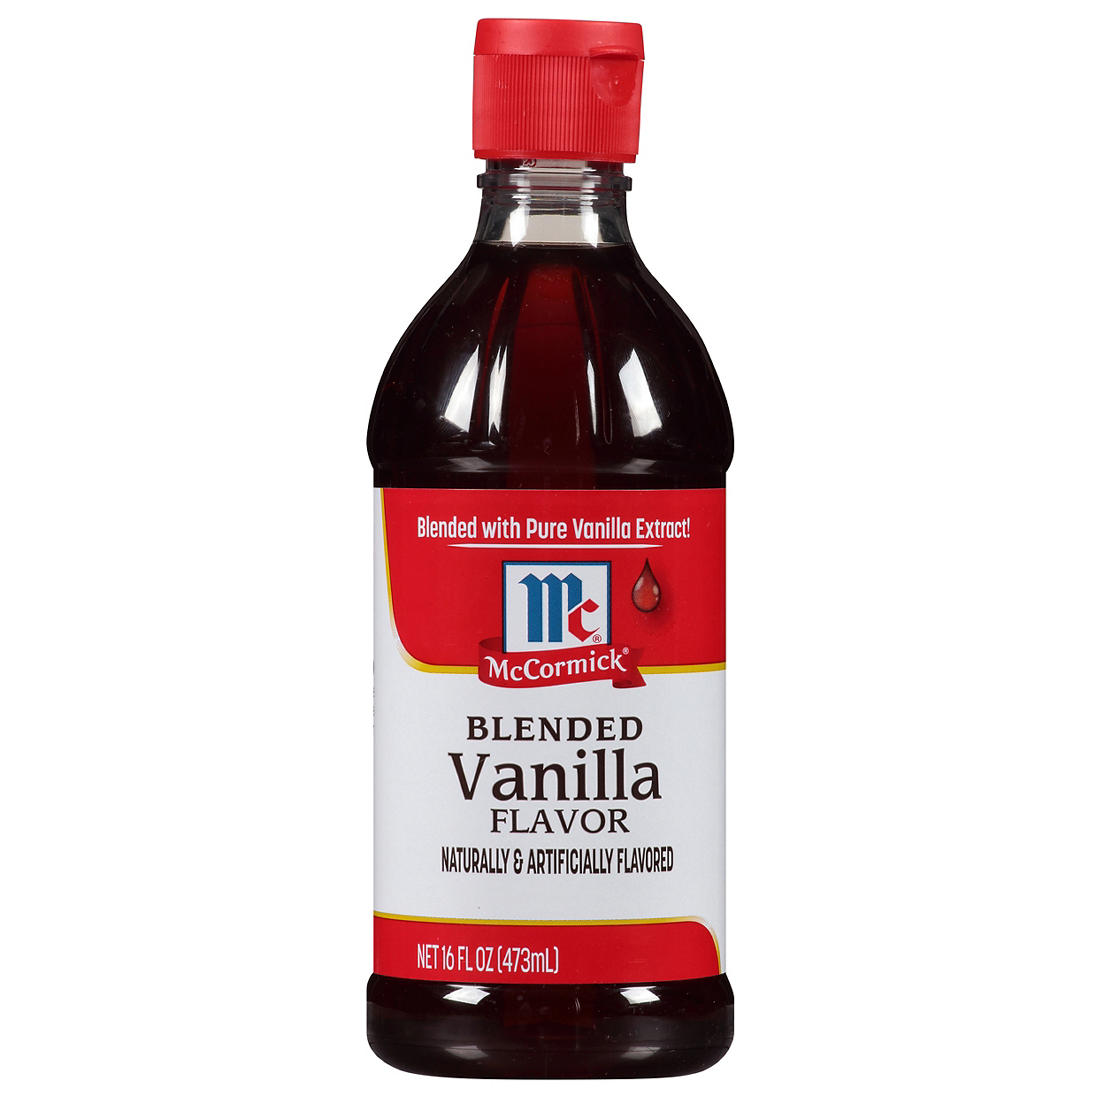 McCormick Blended Vanilla Flavor, 16 fl